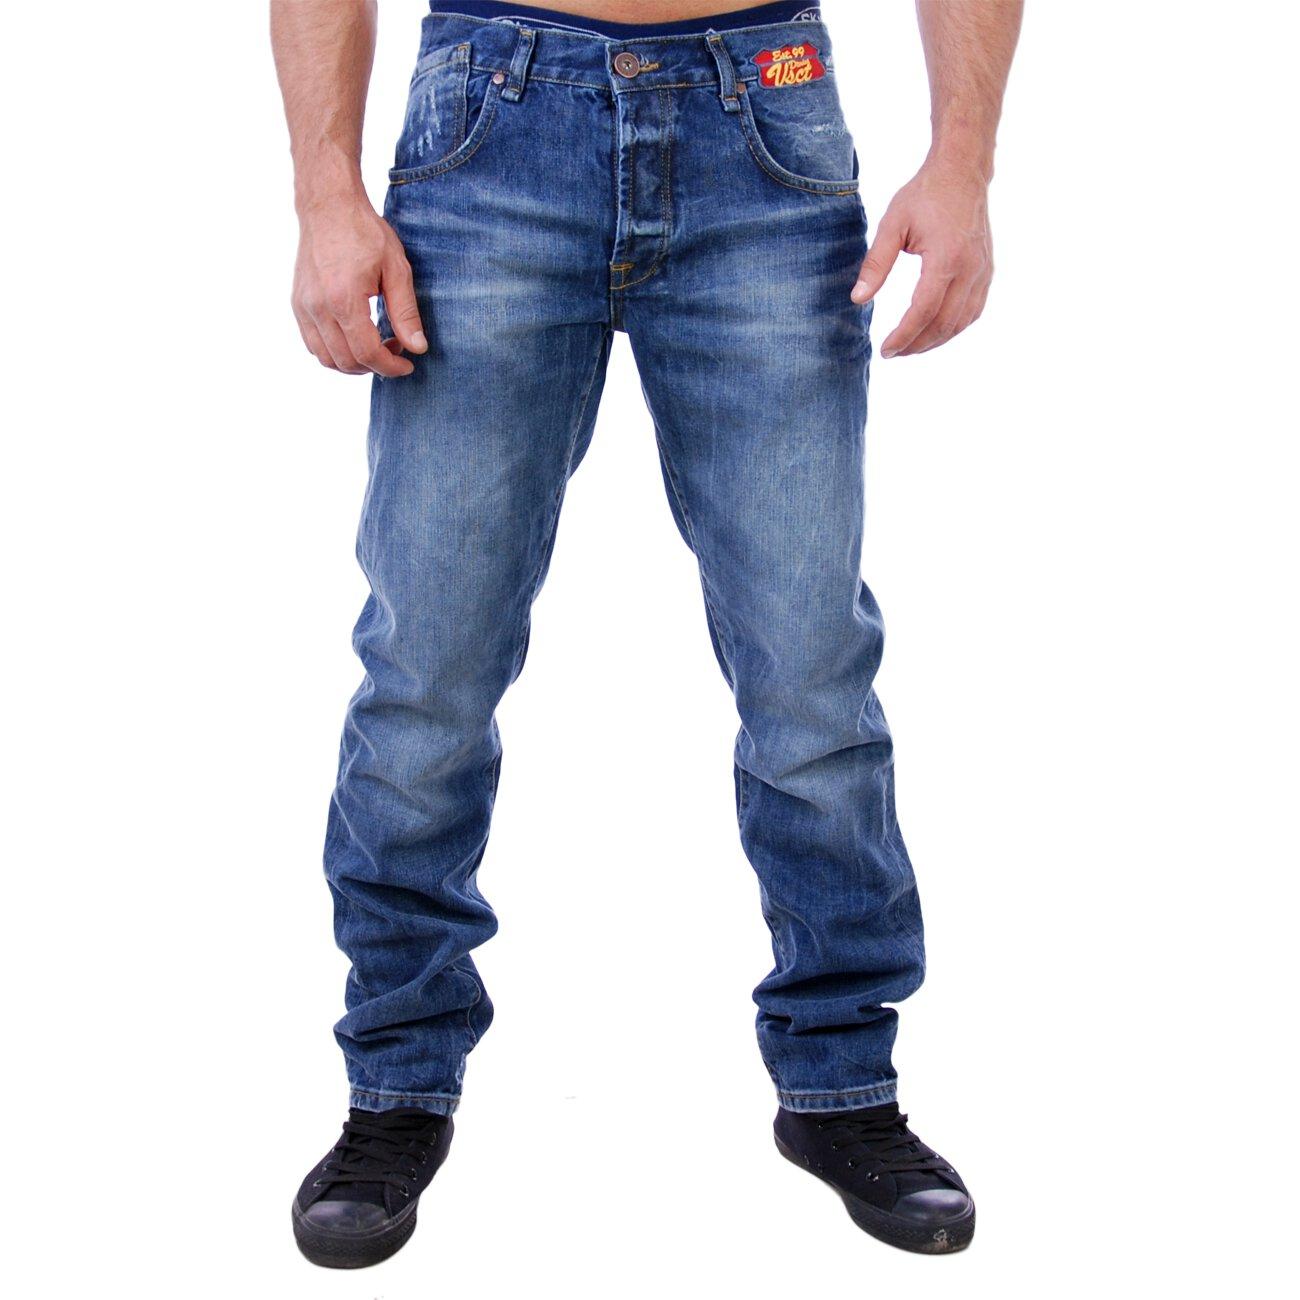 clubwear herren fickstutenmarkt com